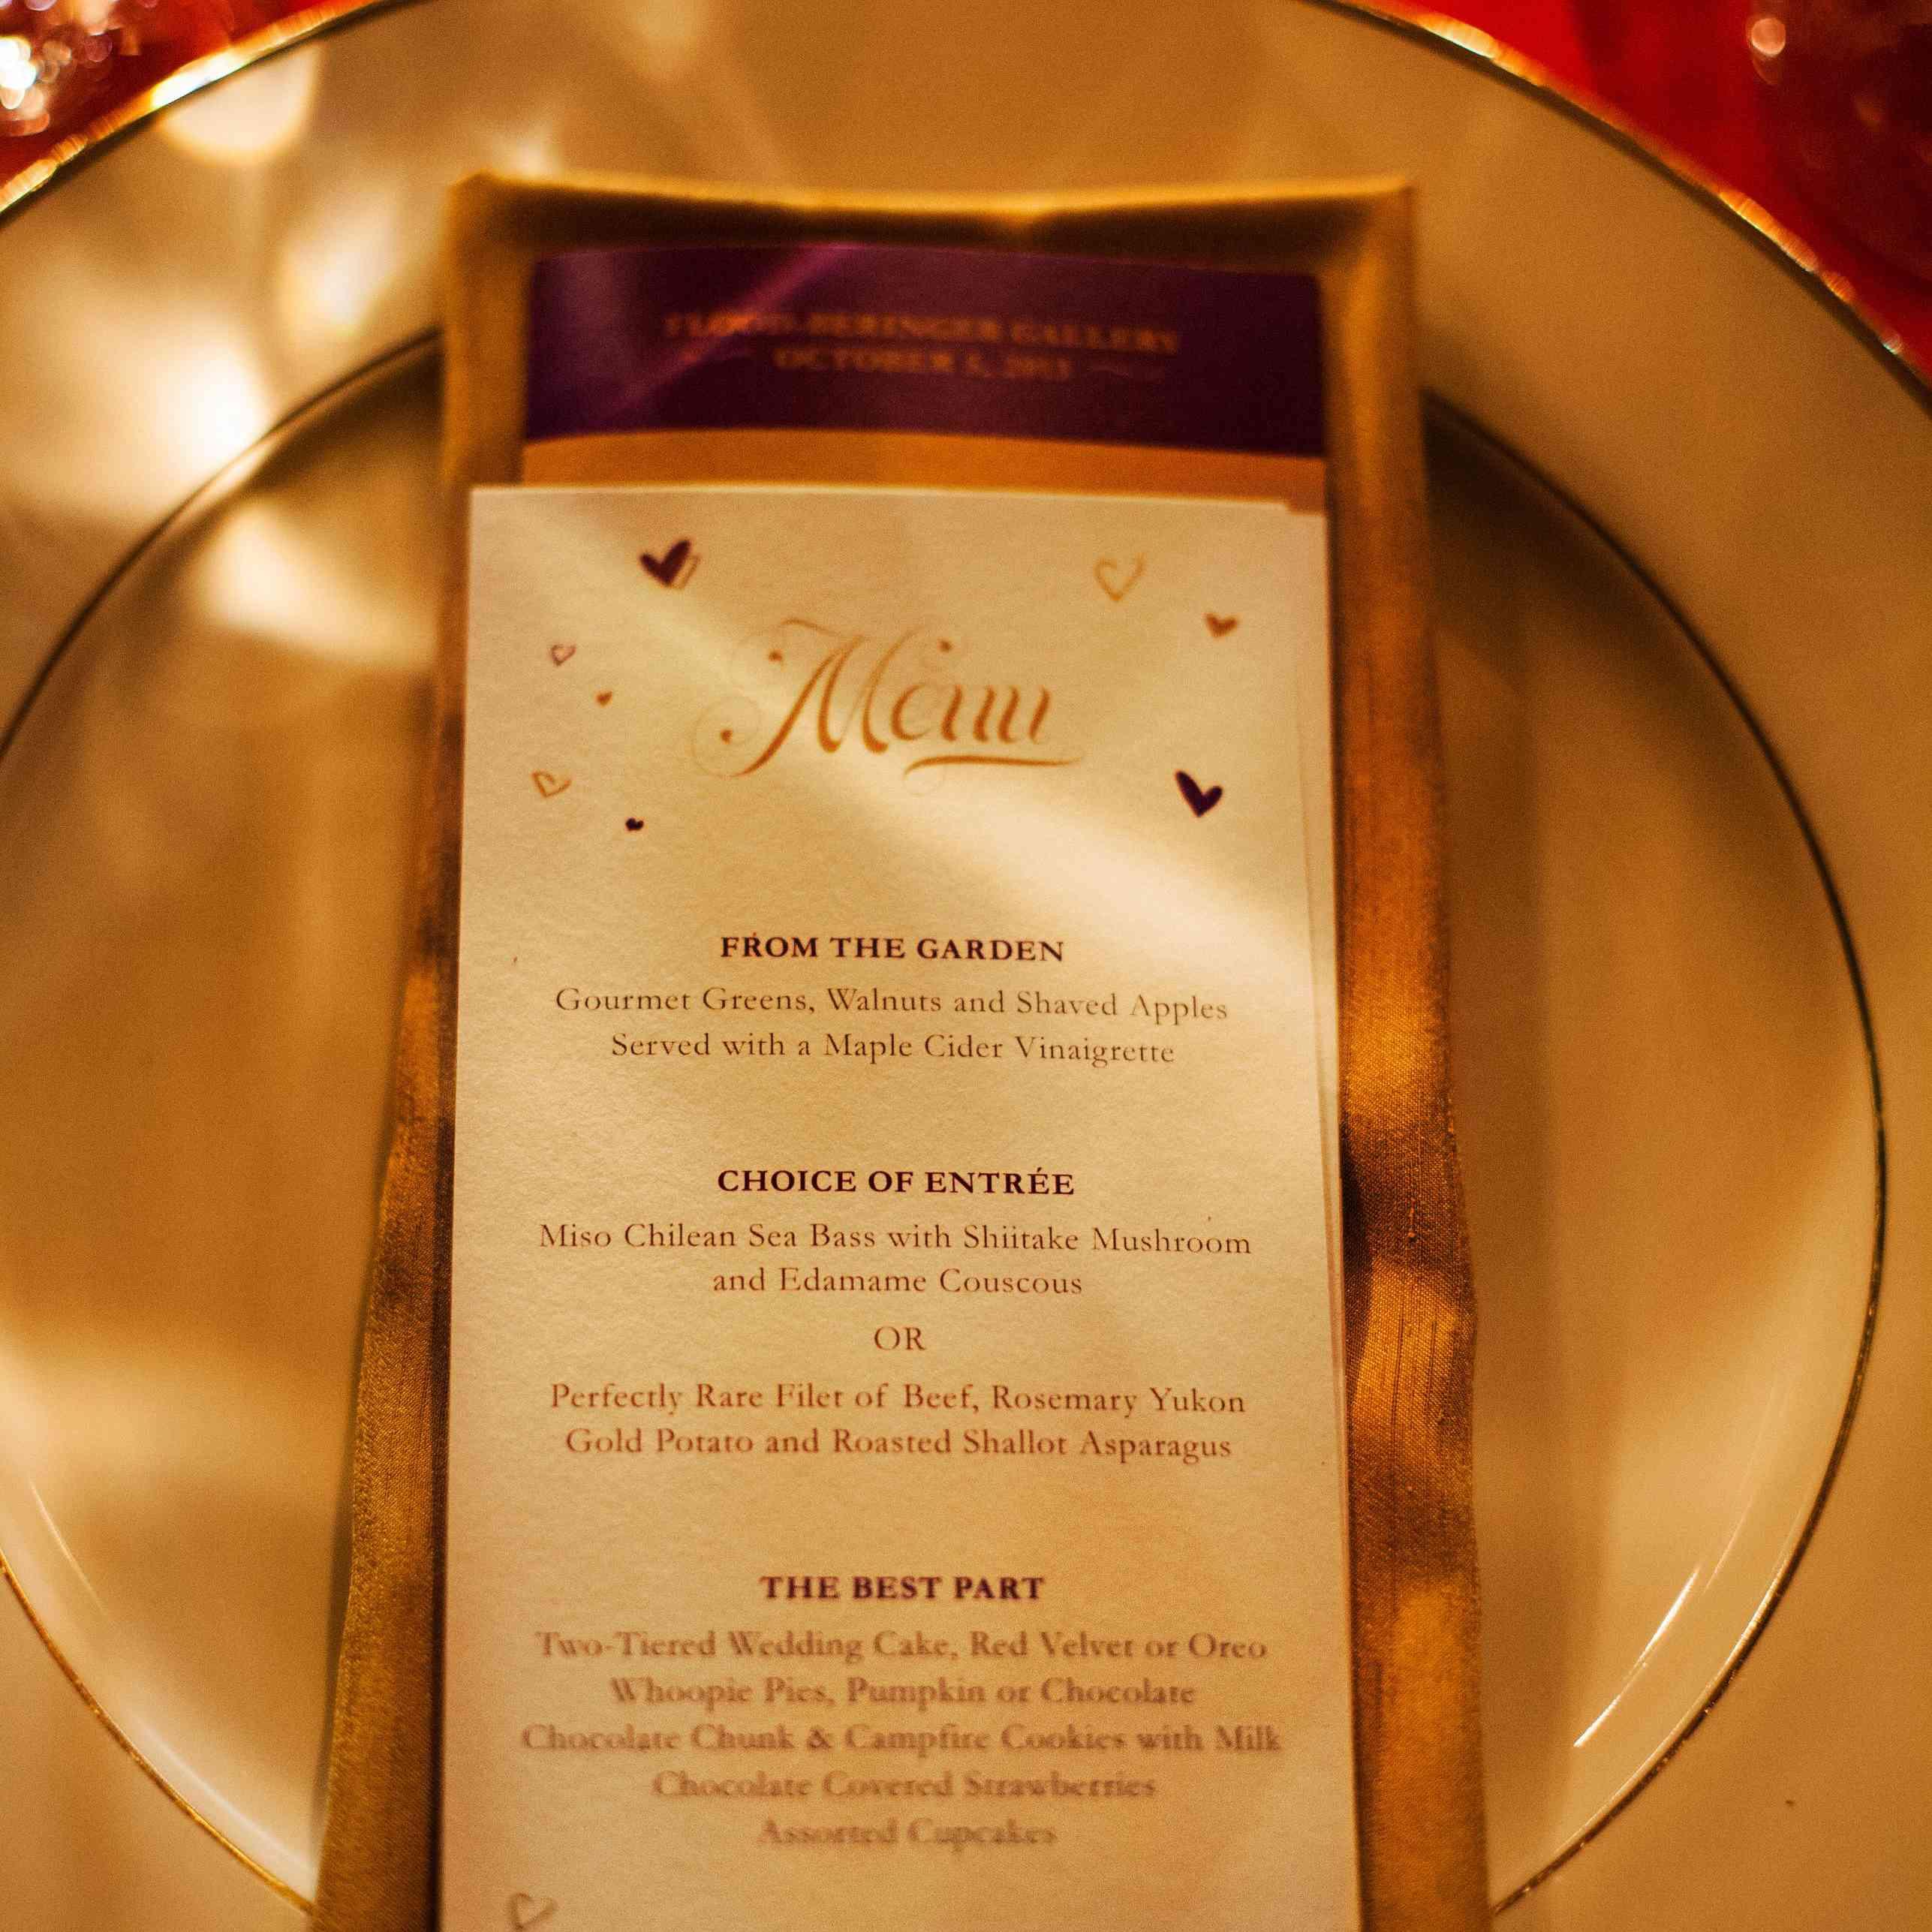 Christian Wedding Reception Ideas: A Personalized Art Gallery Wedding In New York City